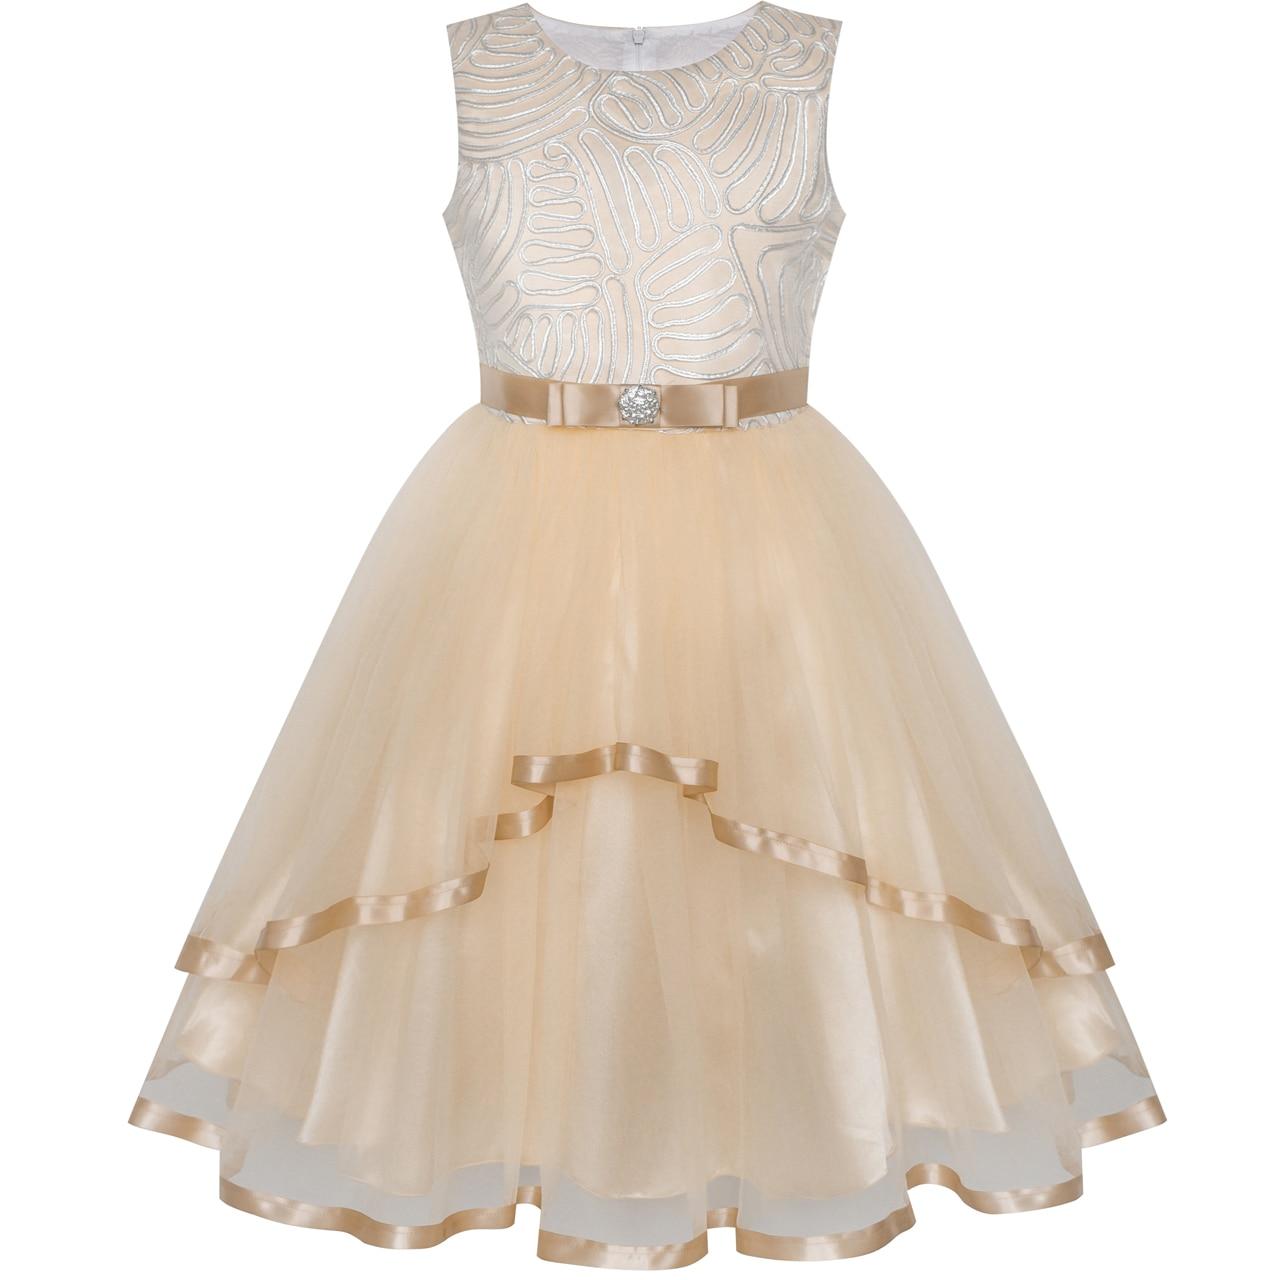 Flower Girl Dress Ivory Wedding Party Dress 2018 Summer Princess Dresses Children Clothes Size 4-12 Pageant Sundress